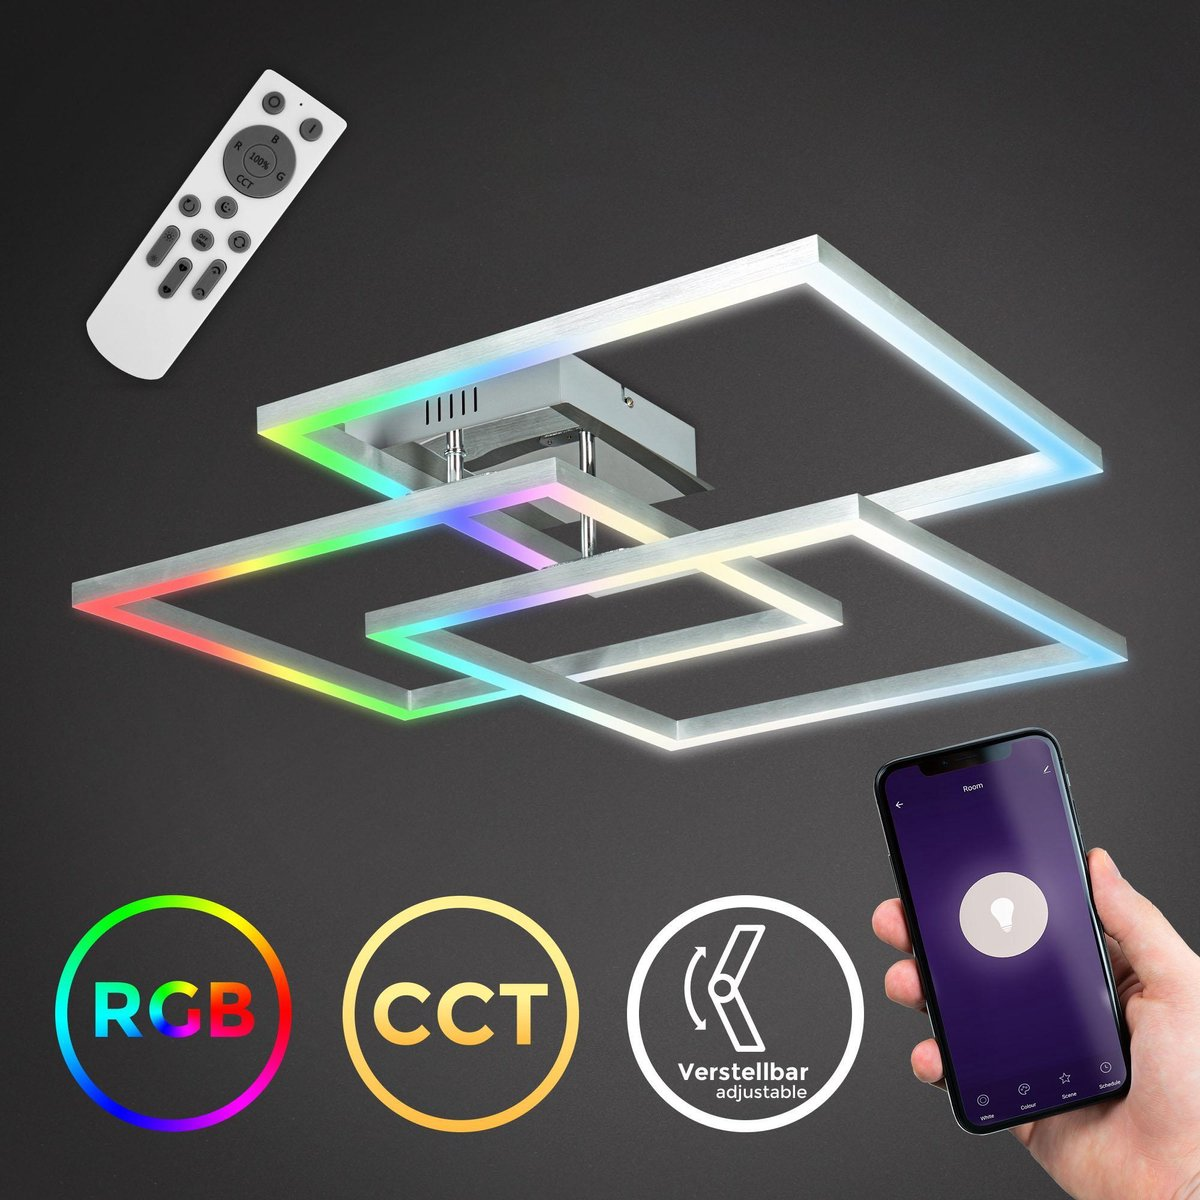 B.K.Licht - LED FRAME lamp - Smart Plafondlamp - WiFi - met App en afstandsbediening - CCT en RGB - dimbaar - 48 Watt - 4800 lumen - Chroom-Aluminium